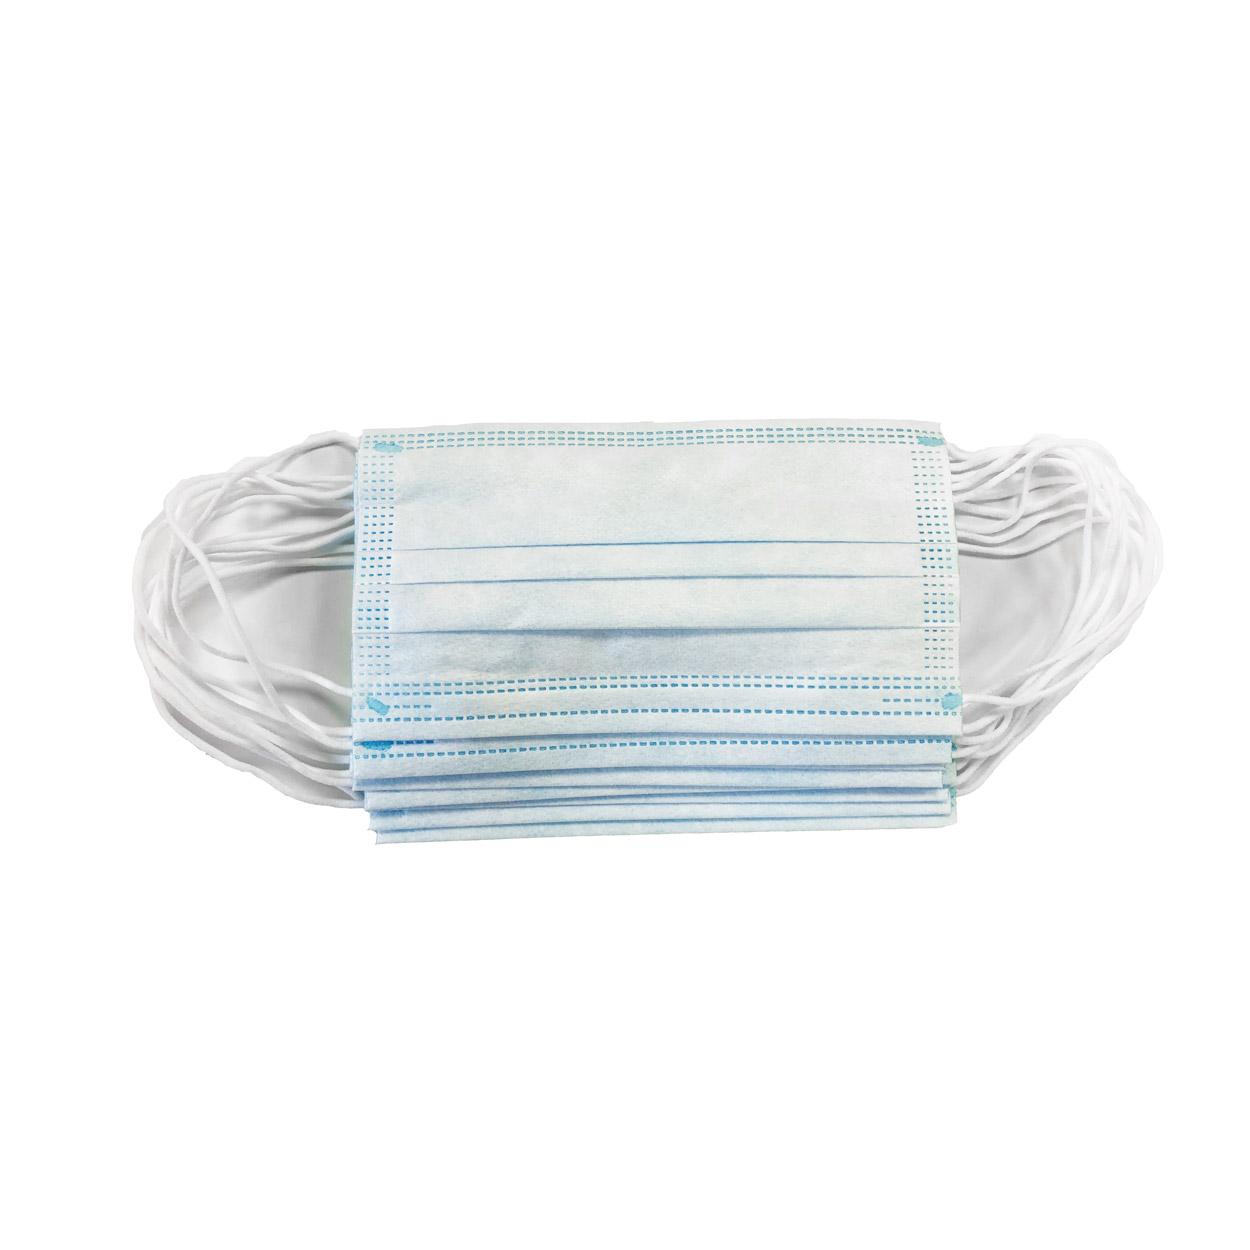 Mundschutz 3-lagig in OP-Qualität, 10er Packung